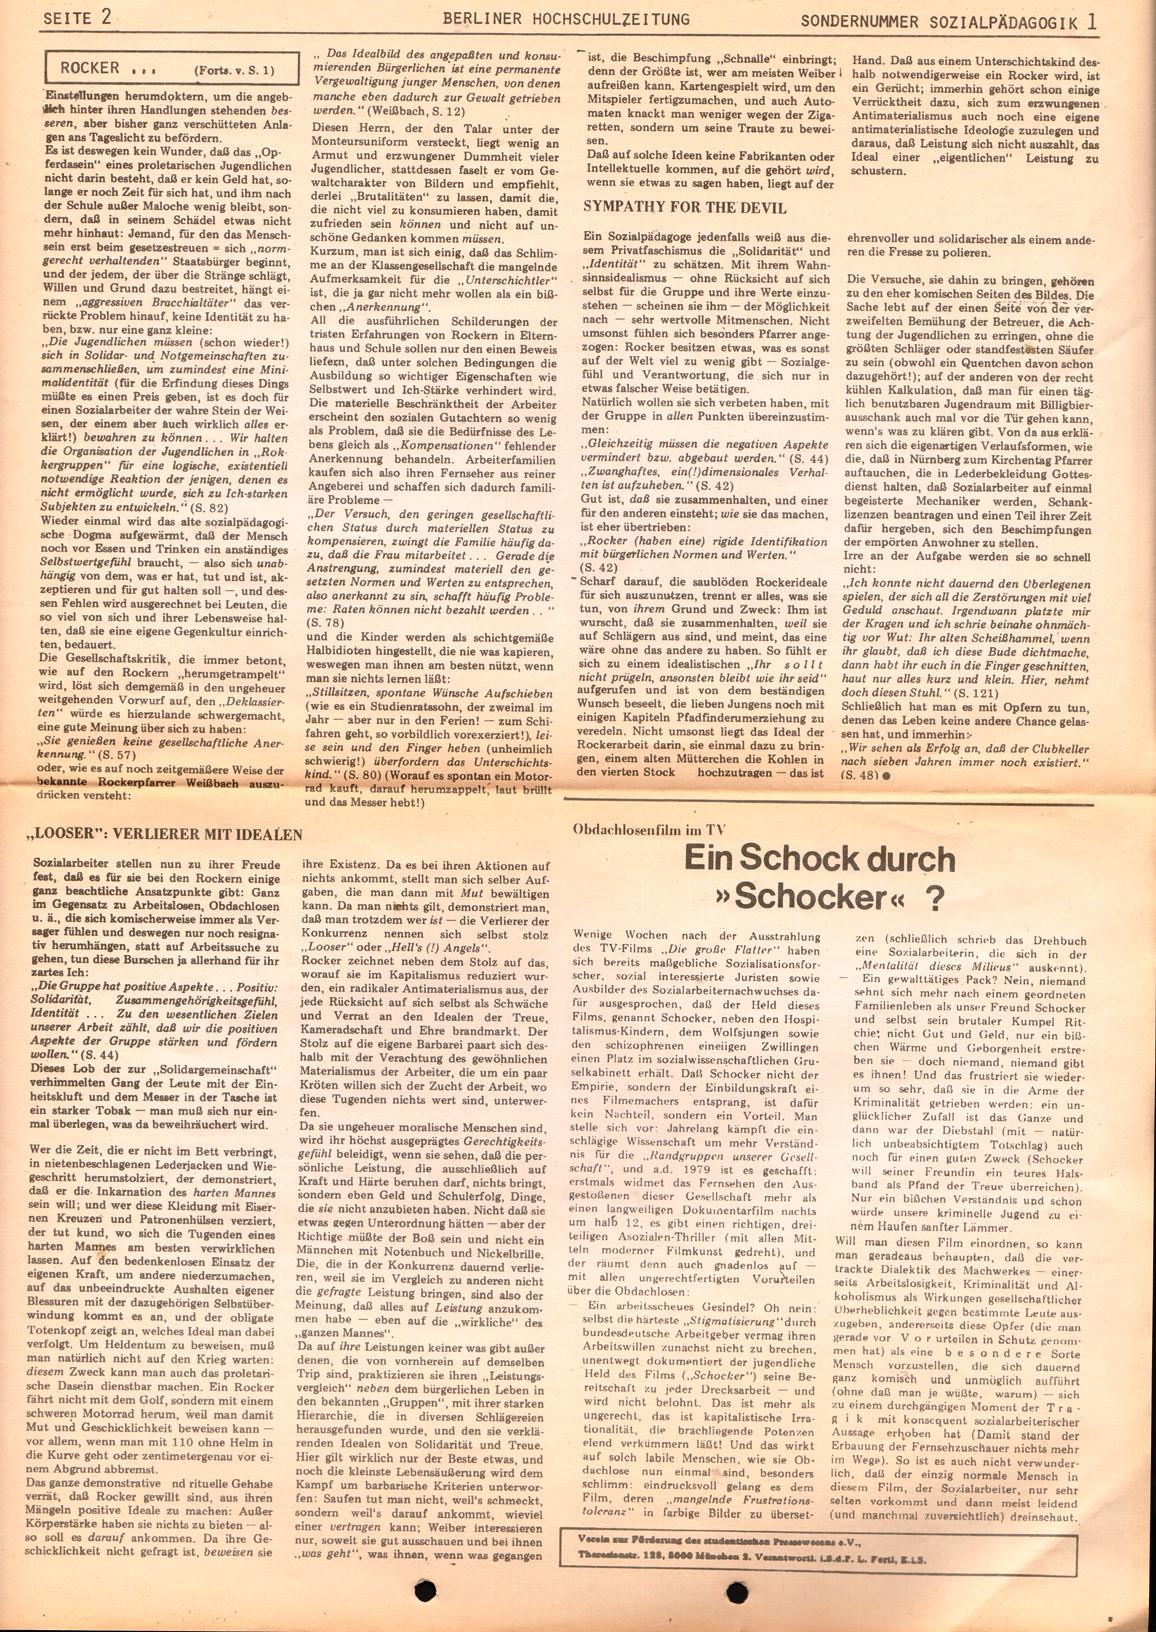 Berlin_MG_Hochschulzeitung_19791100_Sozpaed1_02